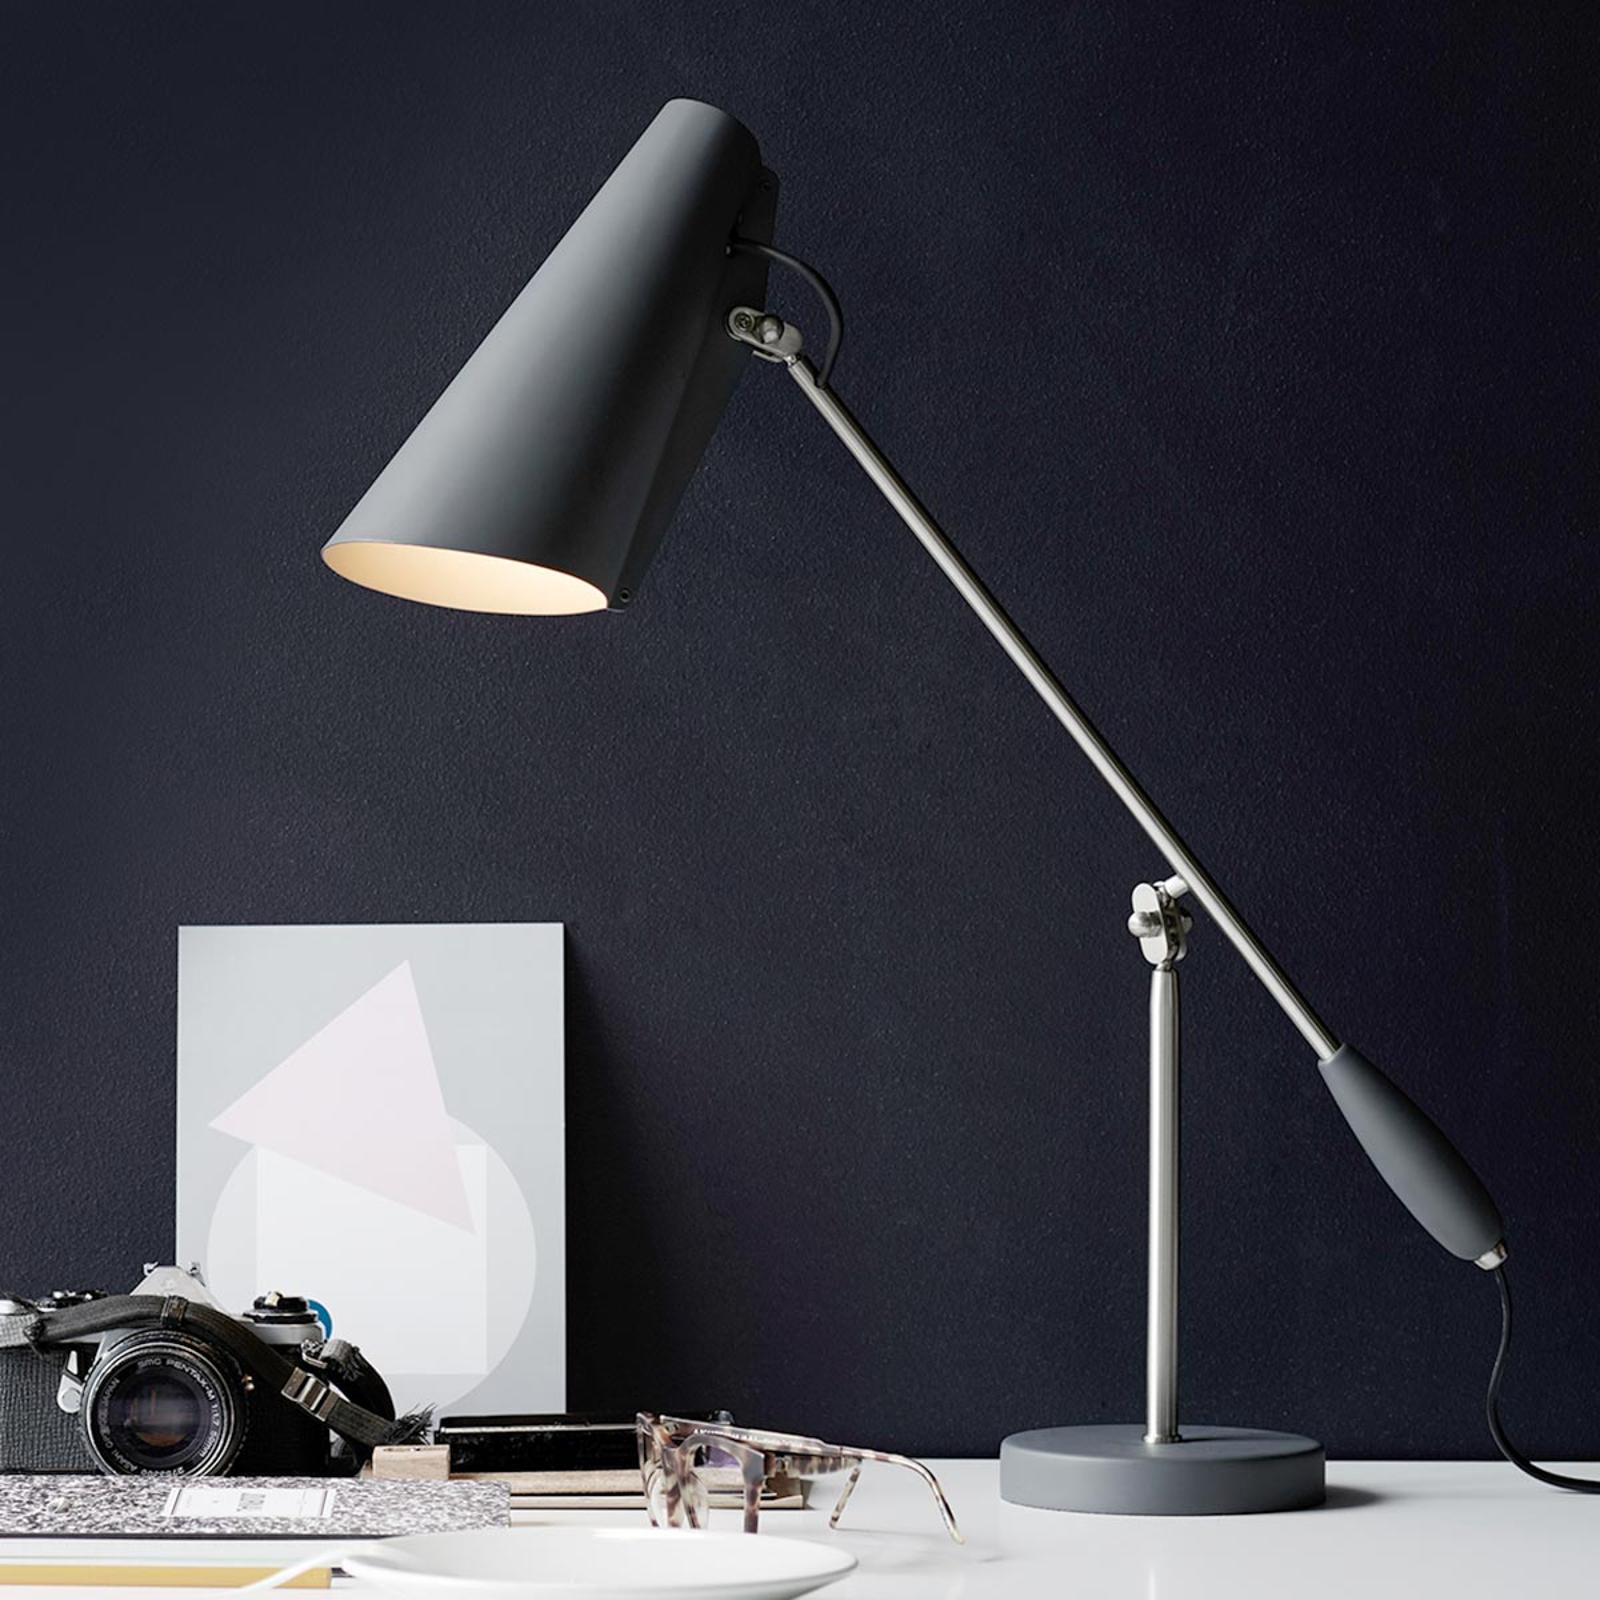 Northern Birdy - lampe à poser rétro, grise